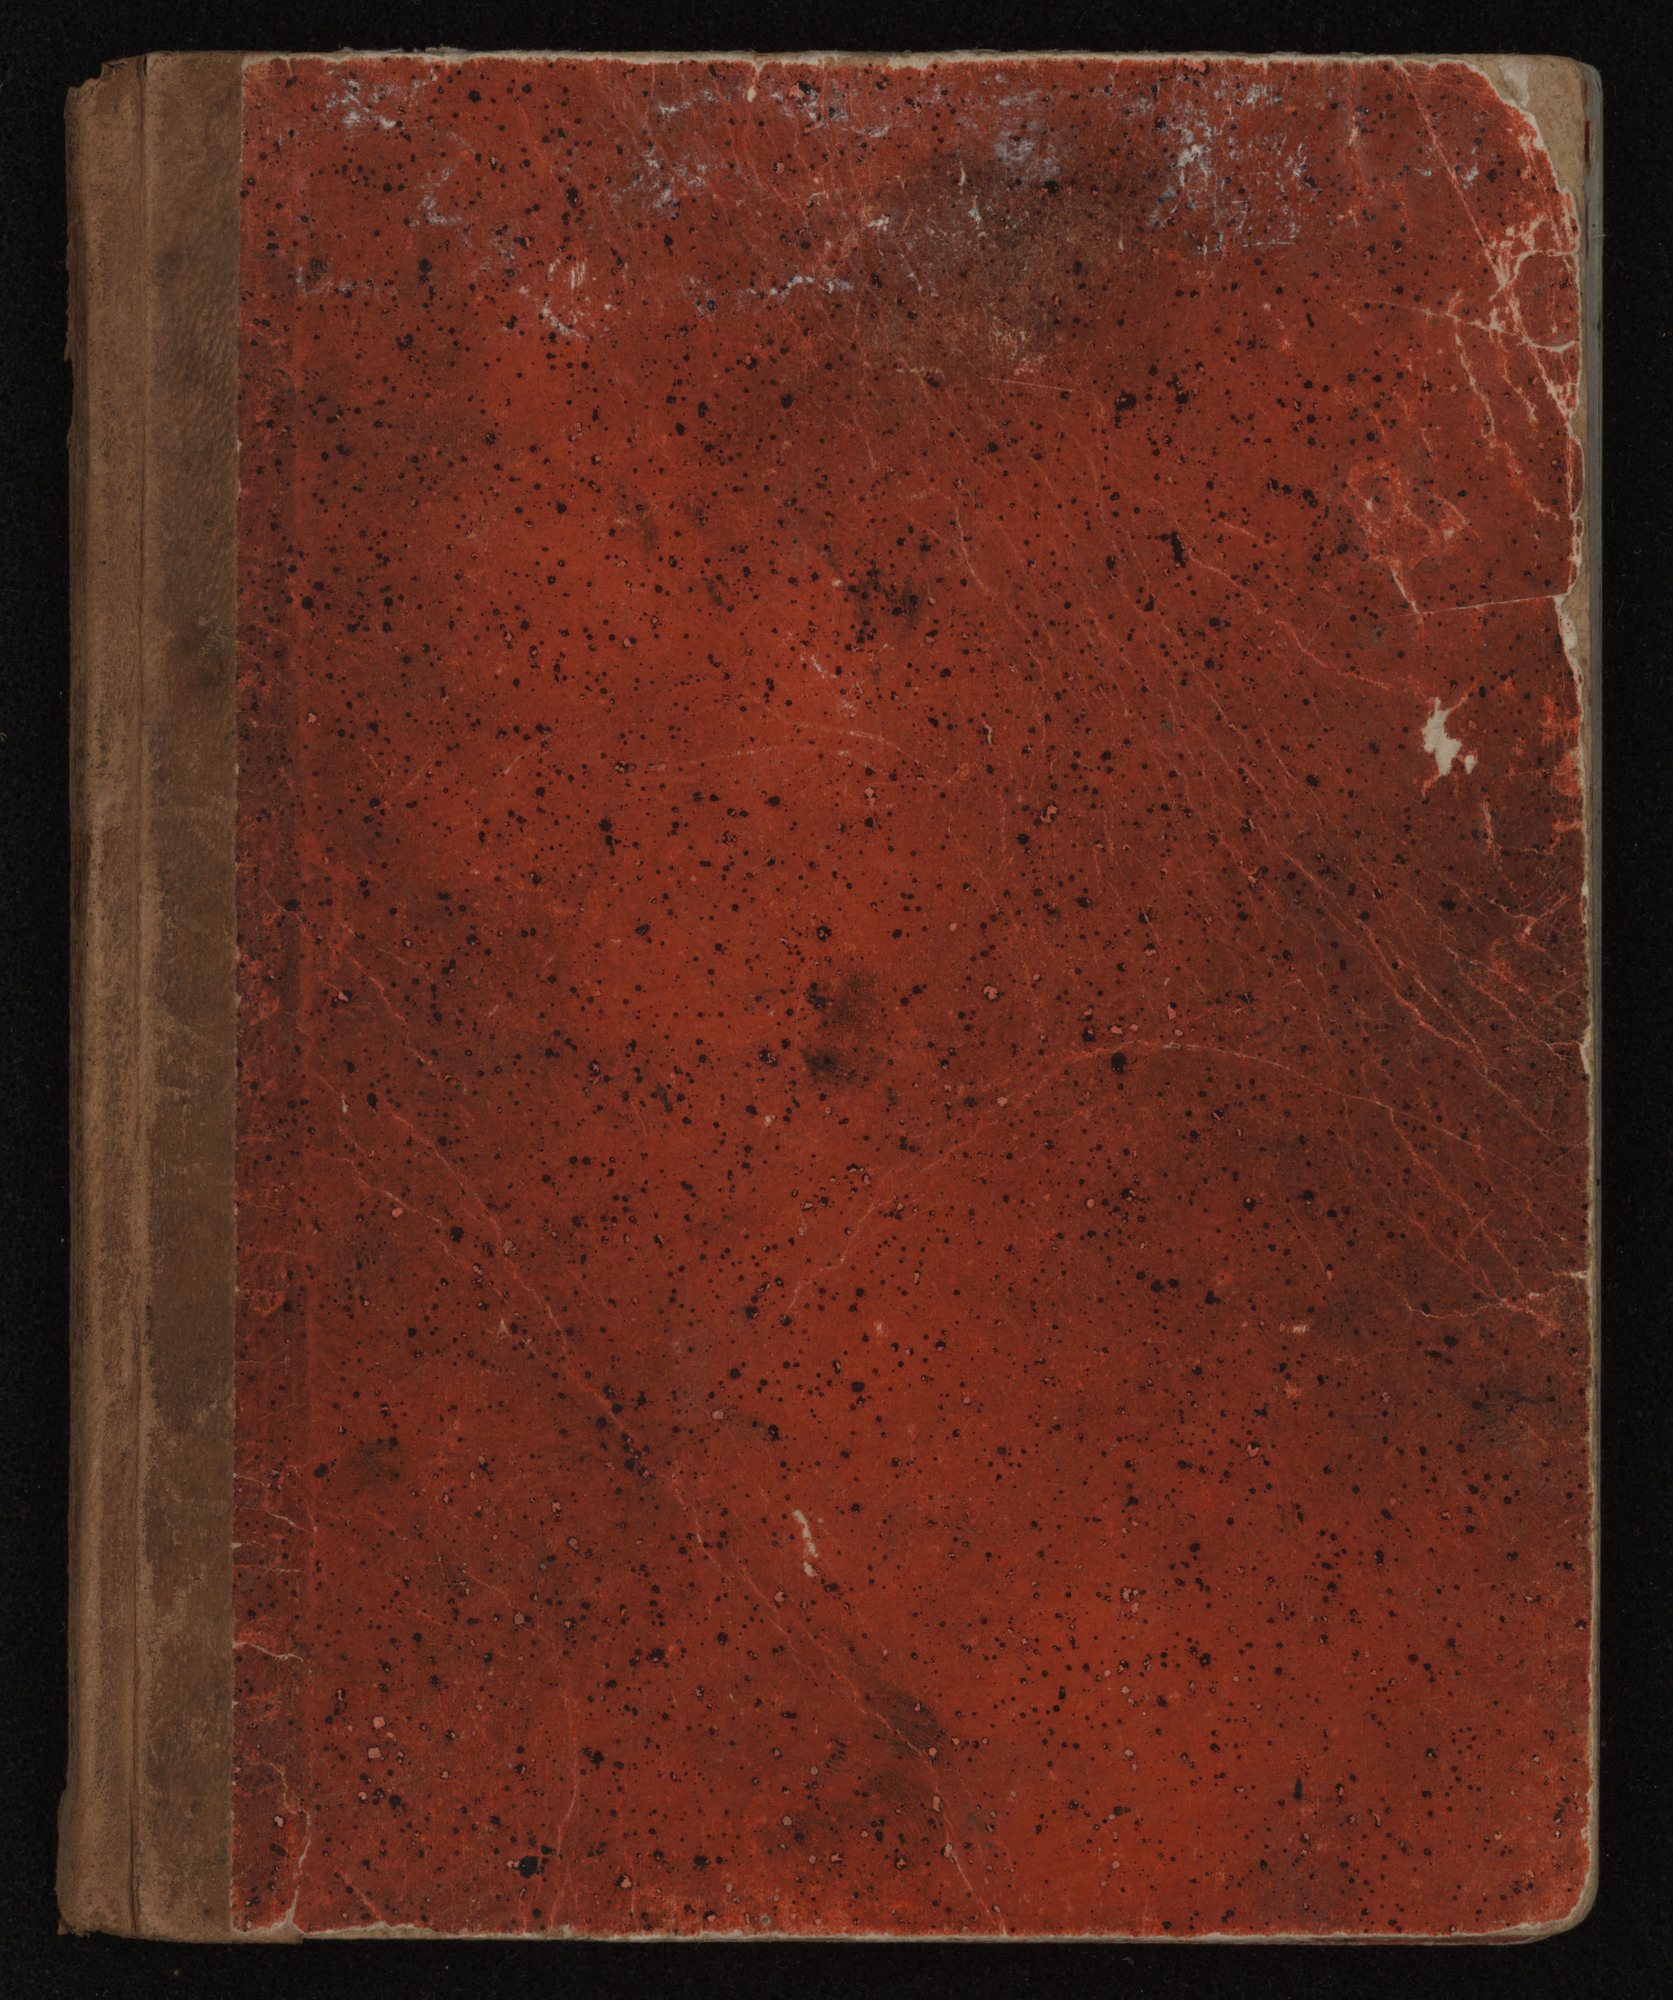 Ms2013_036_BurnellHenry_Diary_1859-1865_Frontcover.jpg